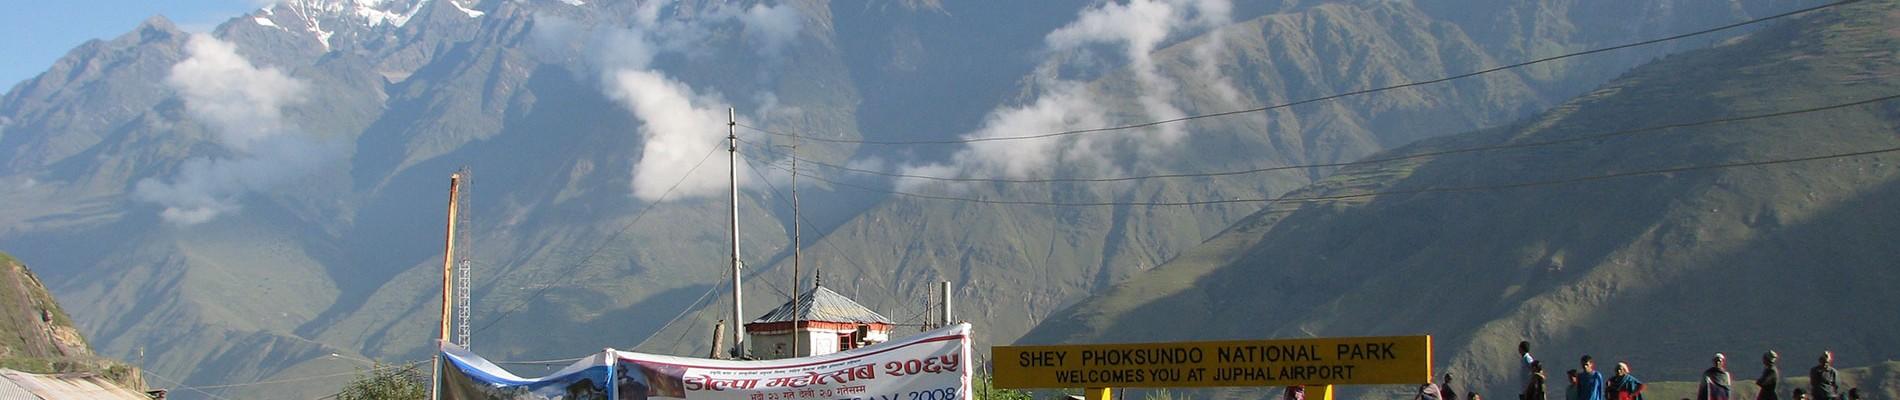 Nepal: 21d Lower Dolpo Trekking